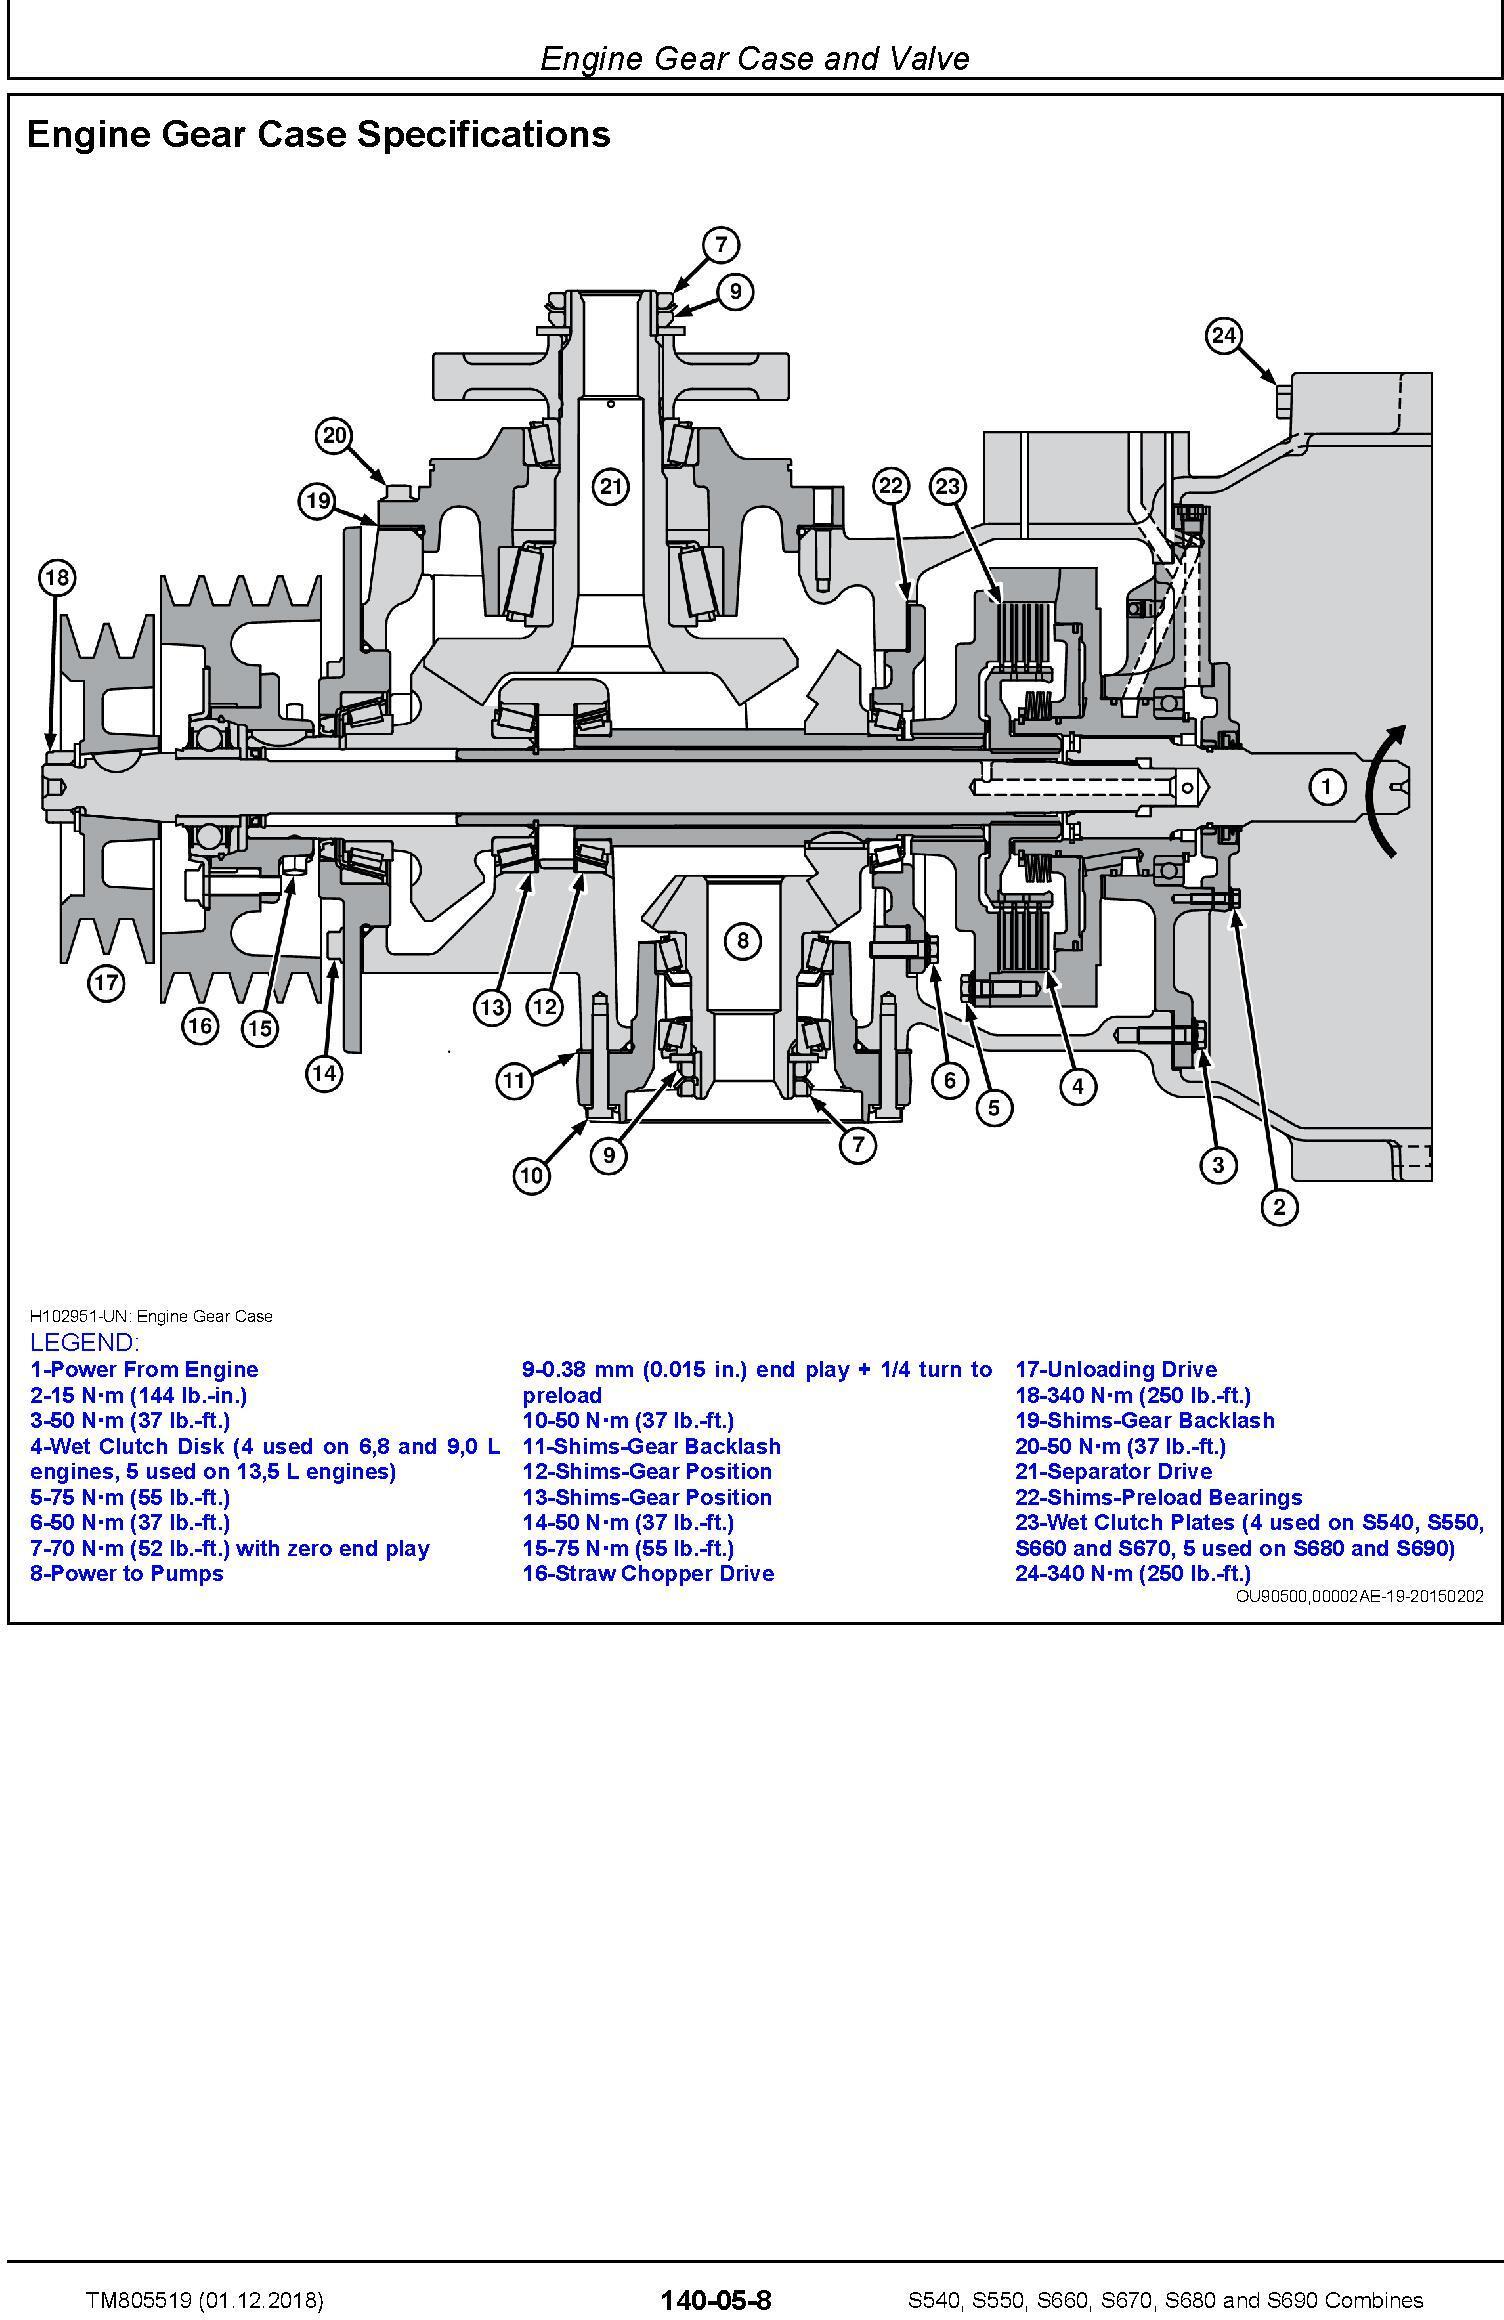 John Deere S540, S550, S660, S670, S680, S690 Combines (SN.120100-) Repair Technical Manual TM805519 - 3